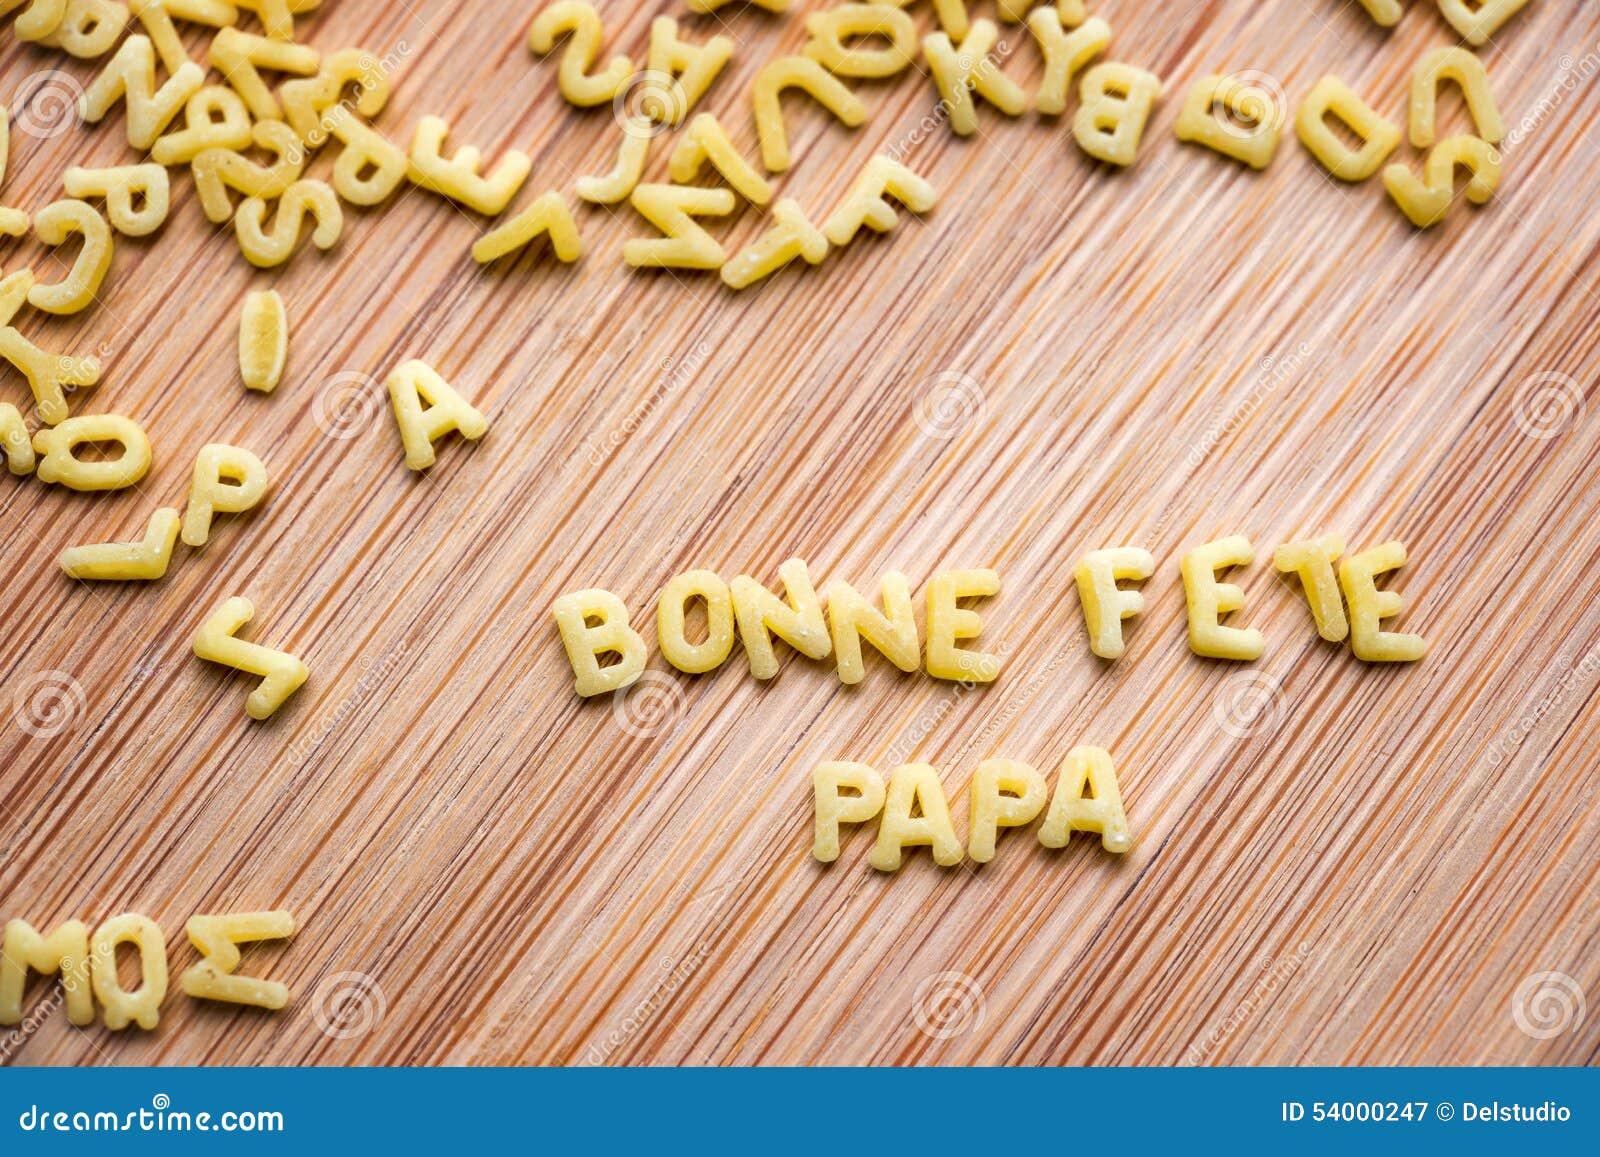 Pasta Forming The Text Bonne Fete Papa Stock Image